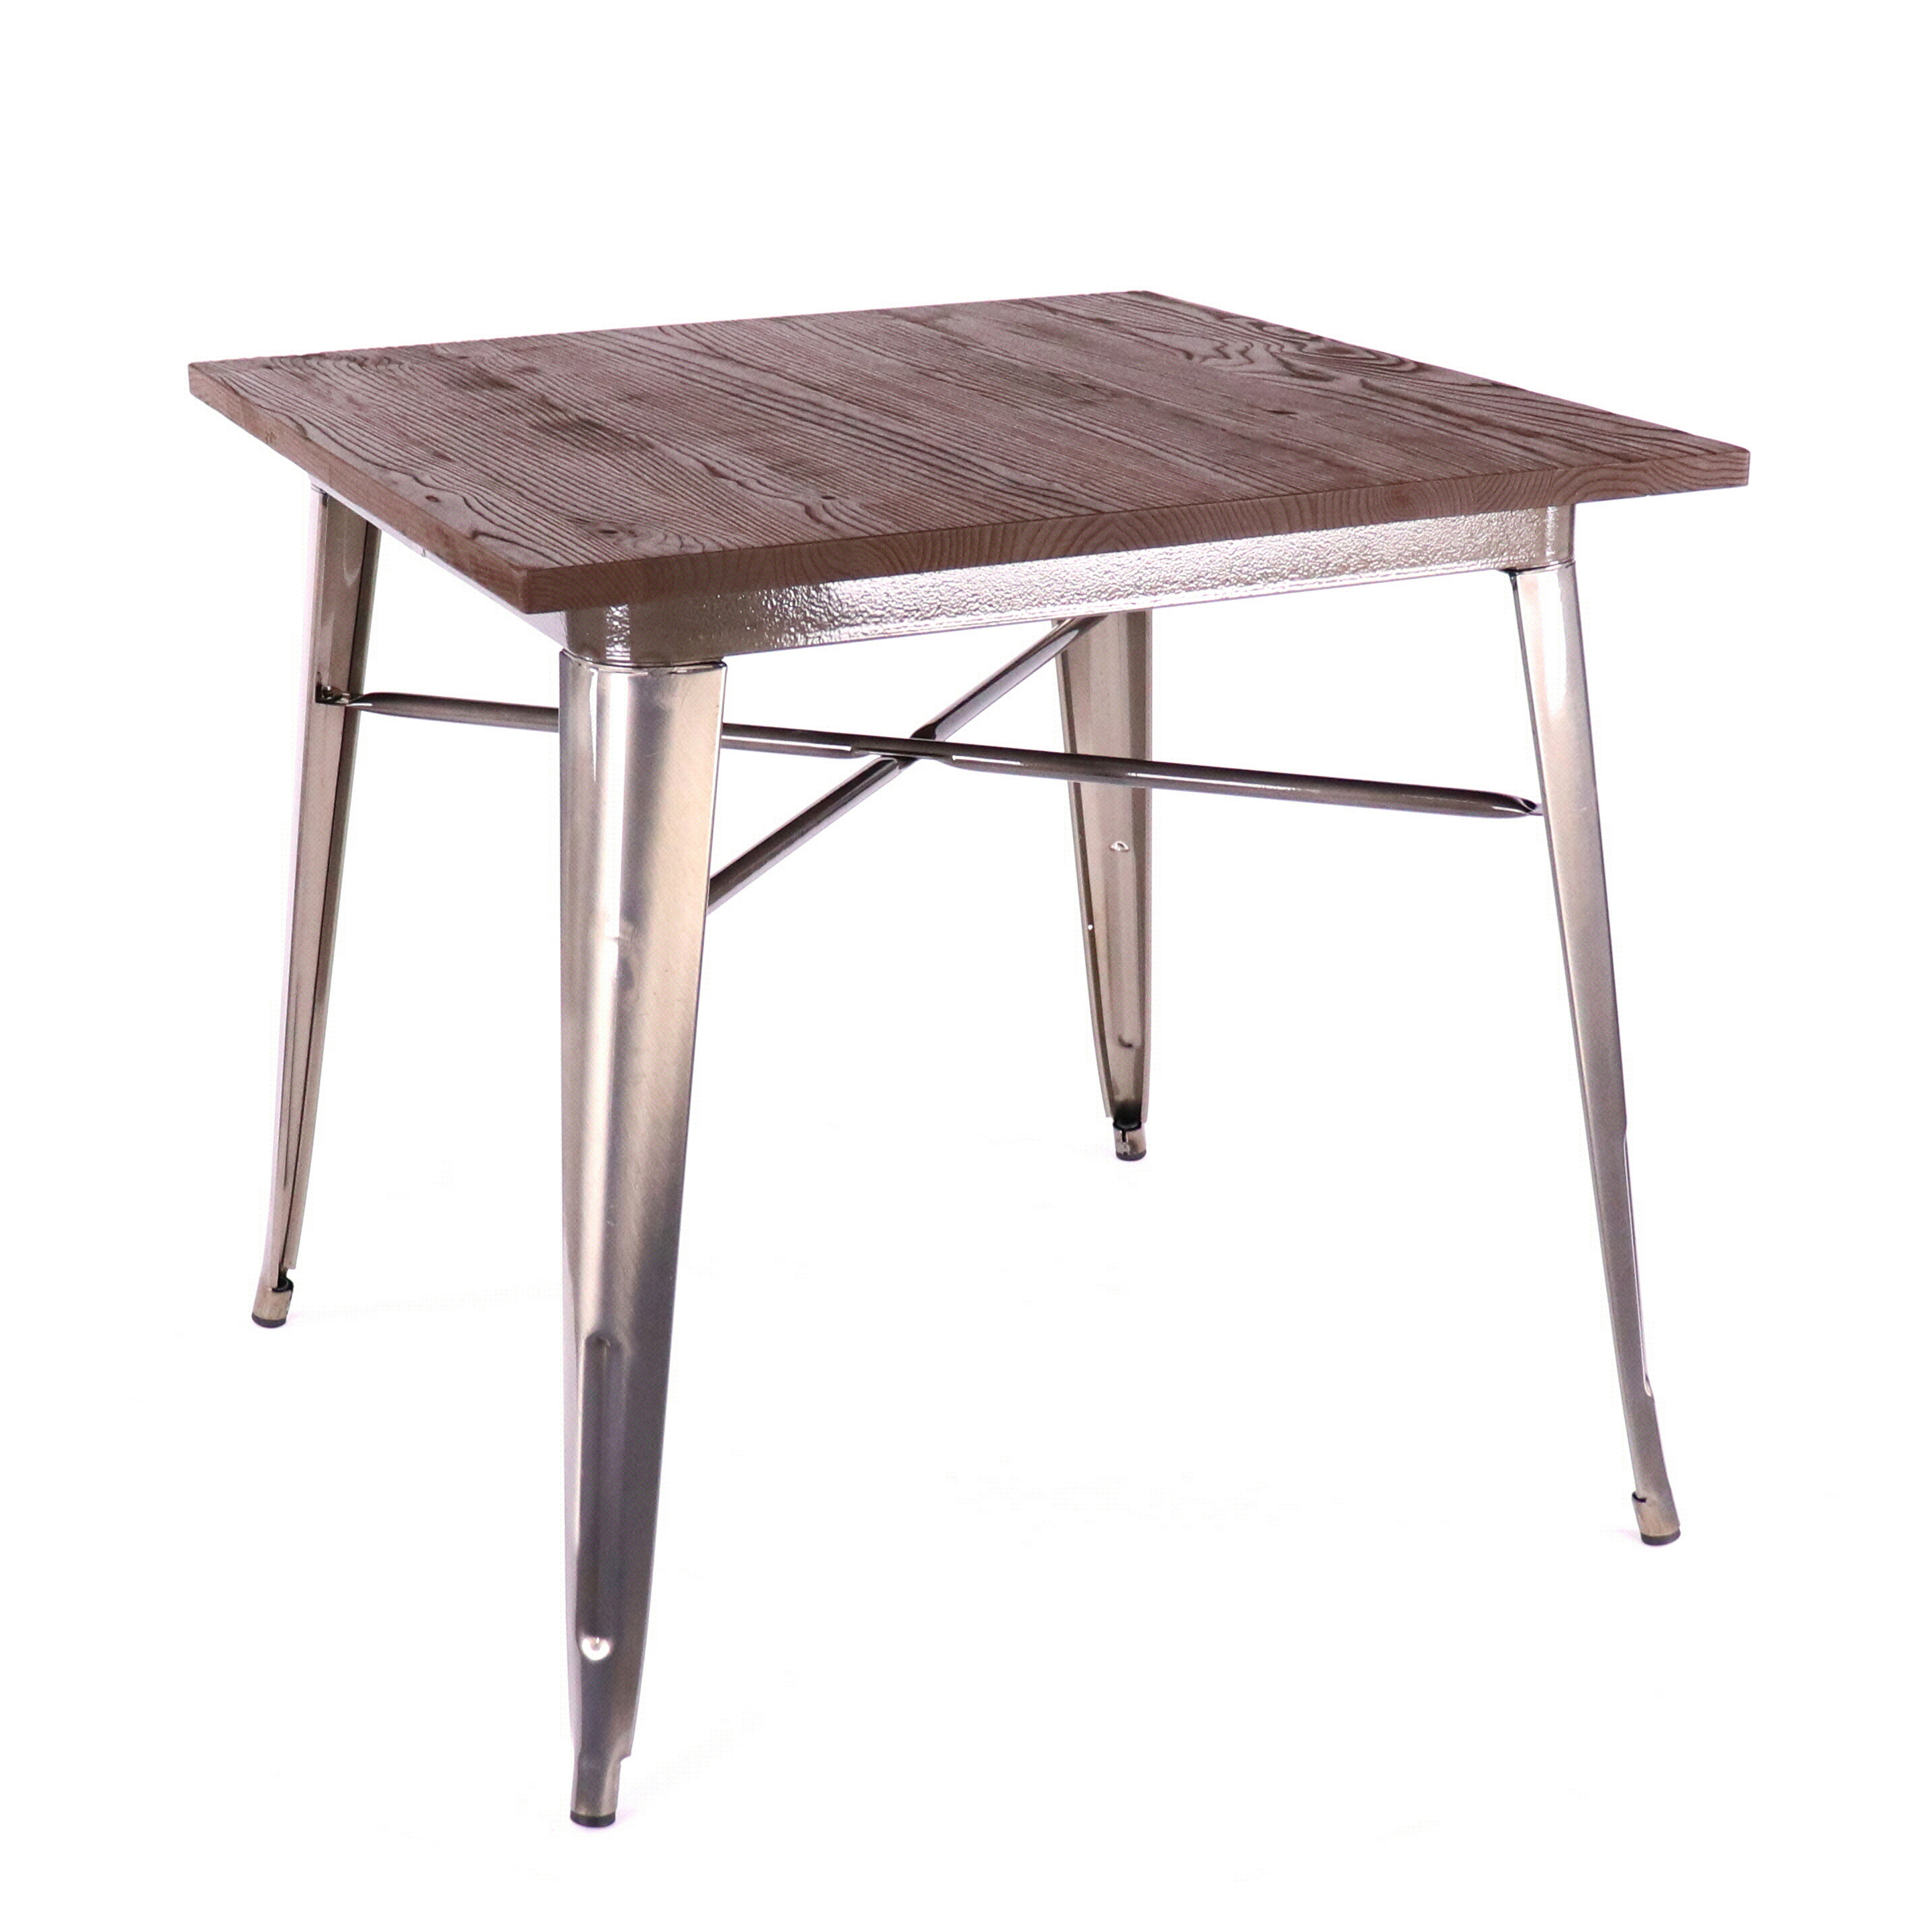 Dreux Rustic Matte Light Elm Wood Steel Dining Table 30 Inch